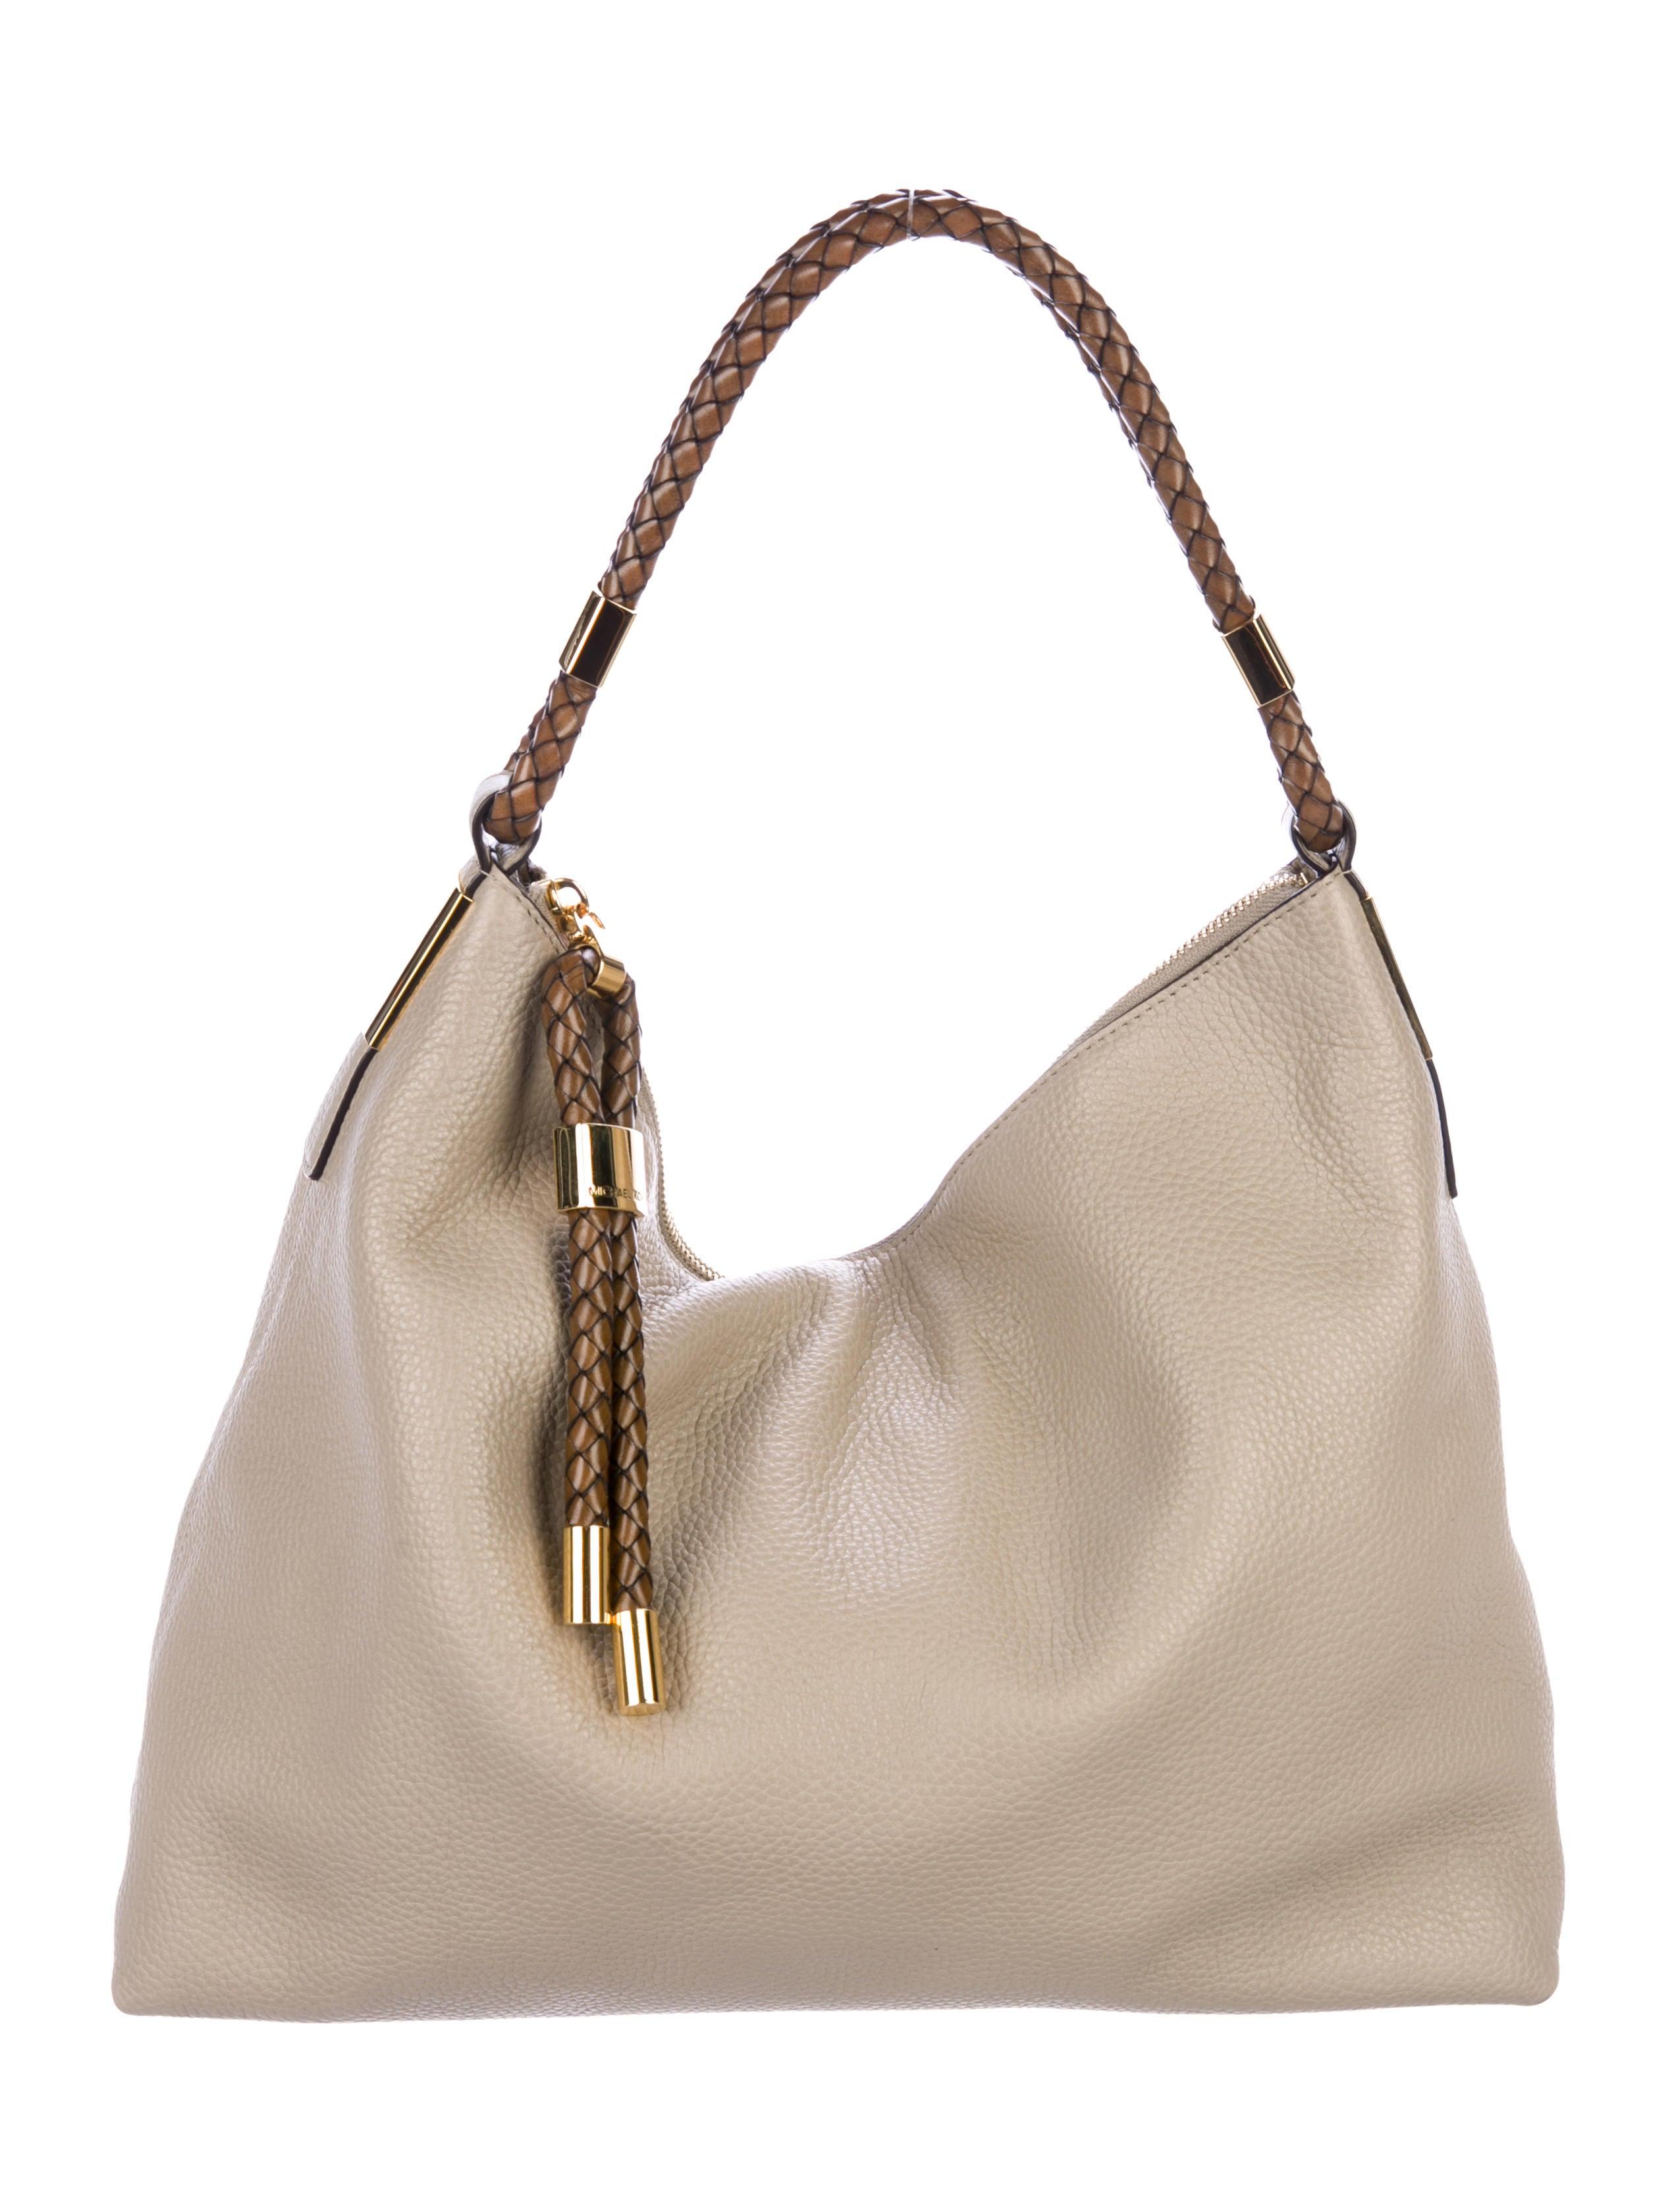 85e111145297 Michael Kors Skorpios Leather Hobo w/ Tags - Handbags - MIC75763 | The  RealReal